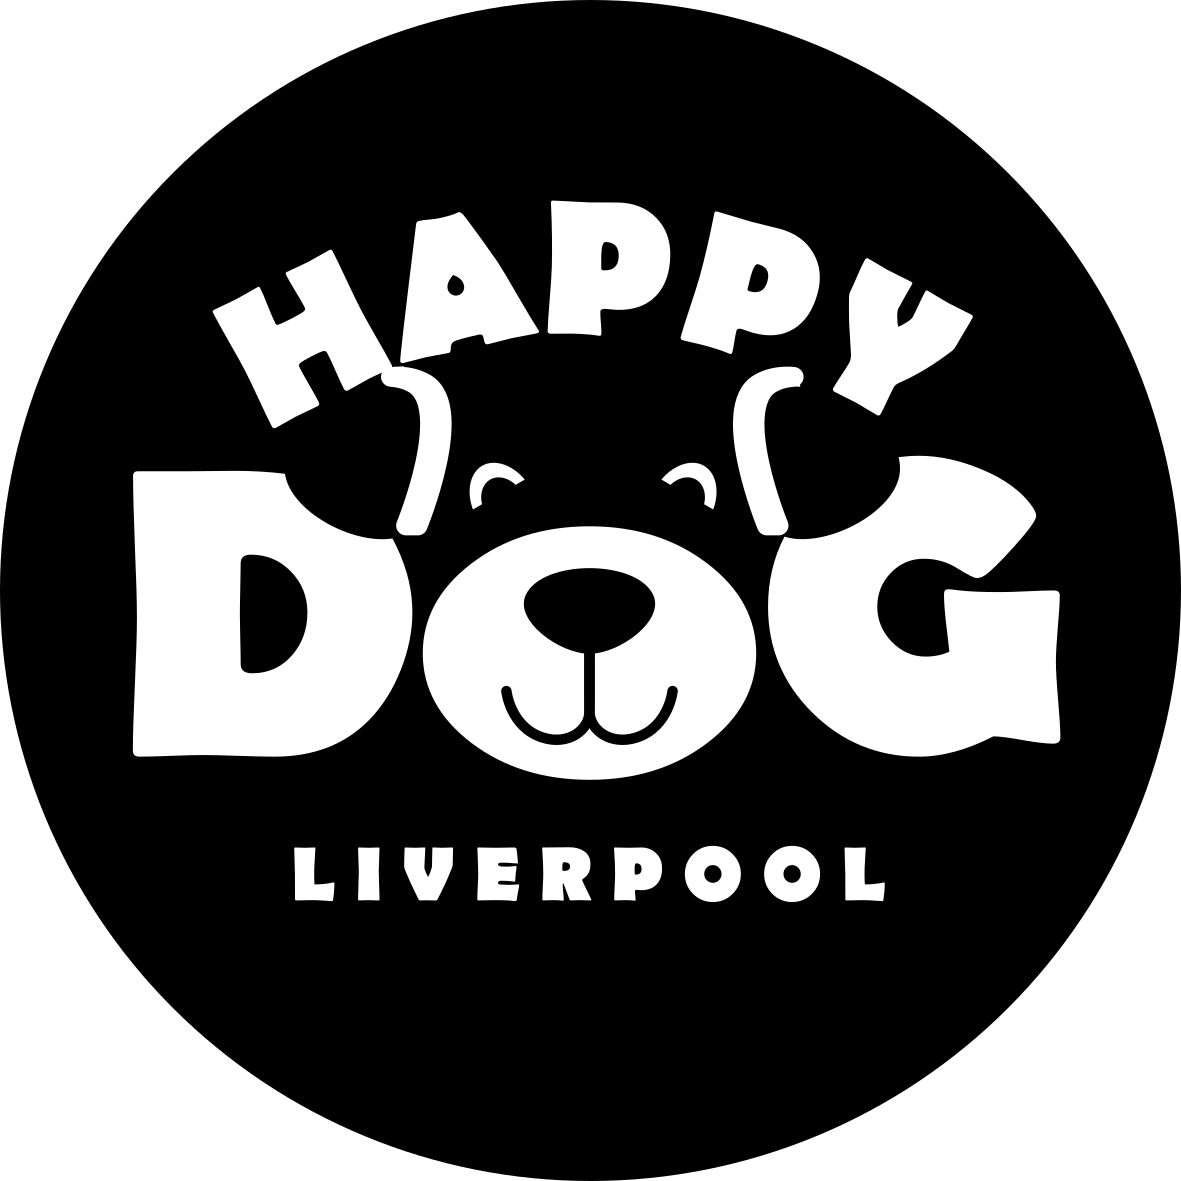 Dog Walking Liverpool